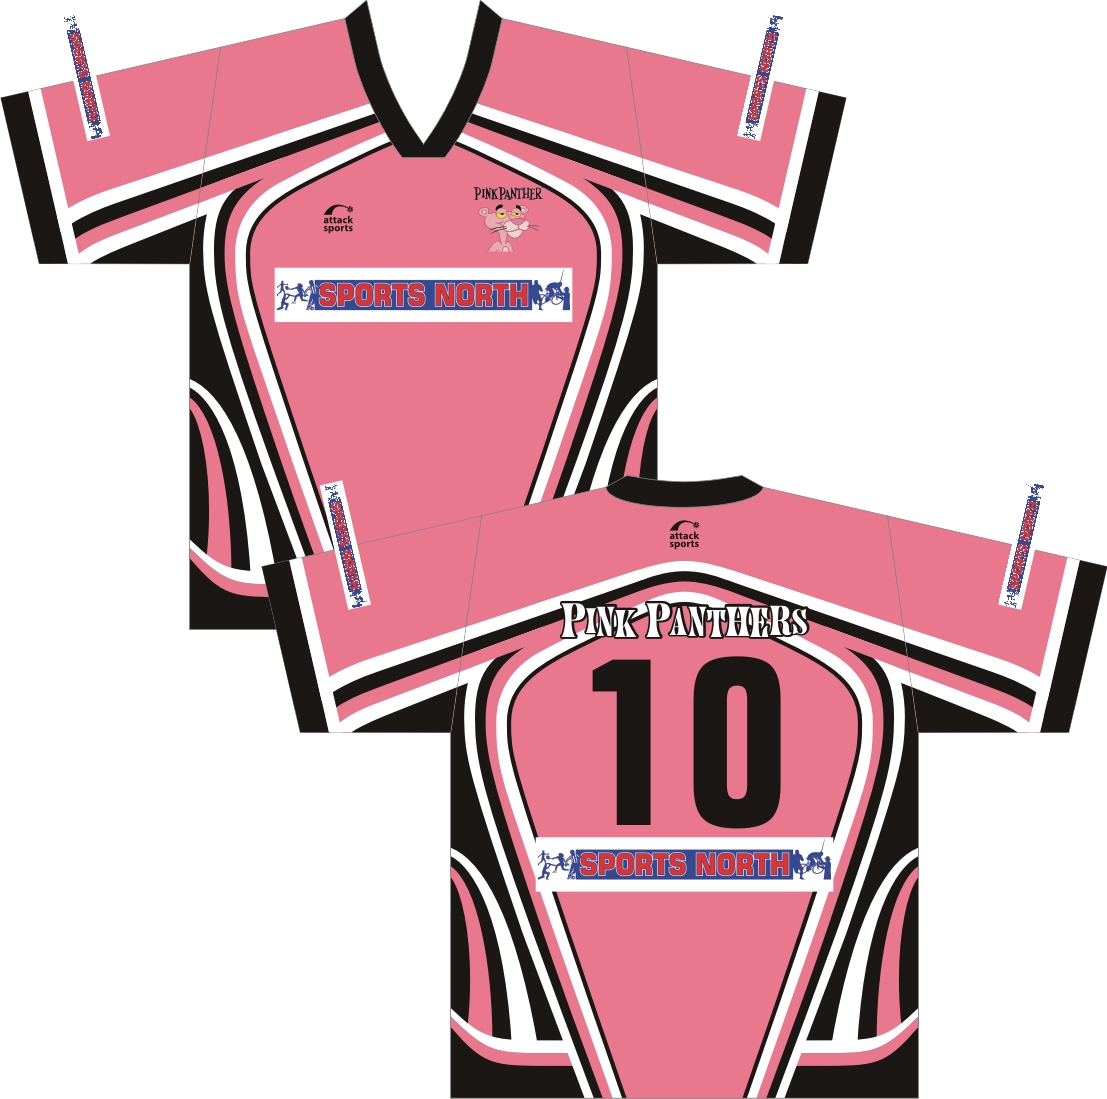 Pink Panthers